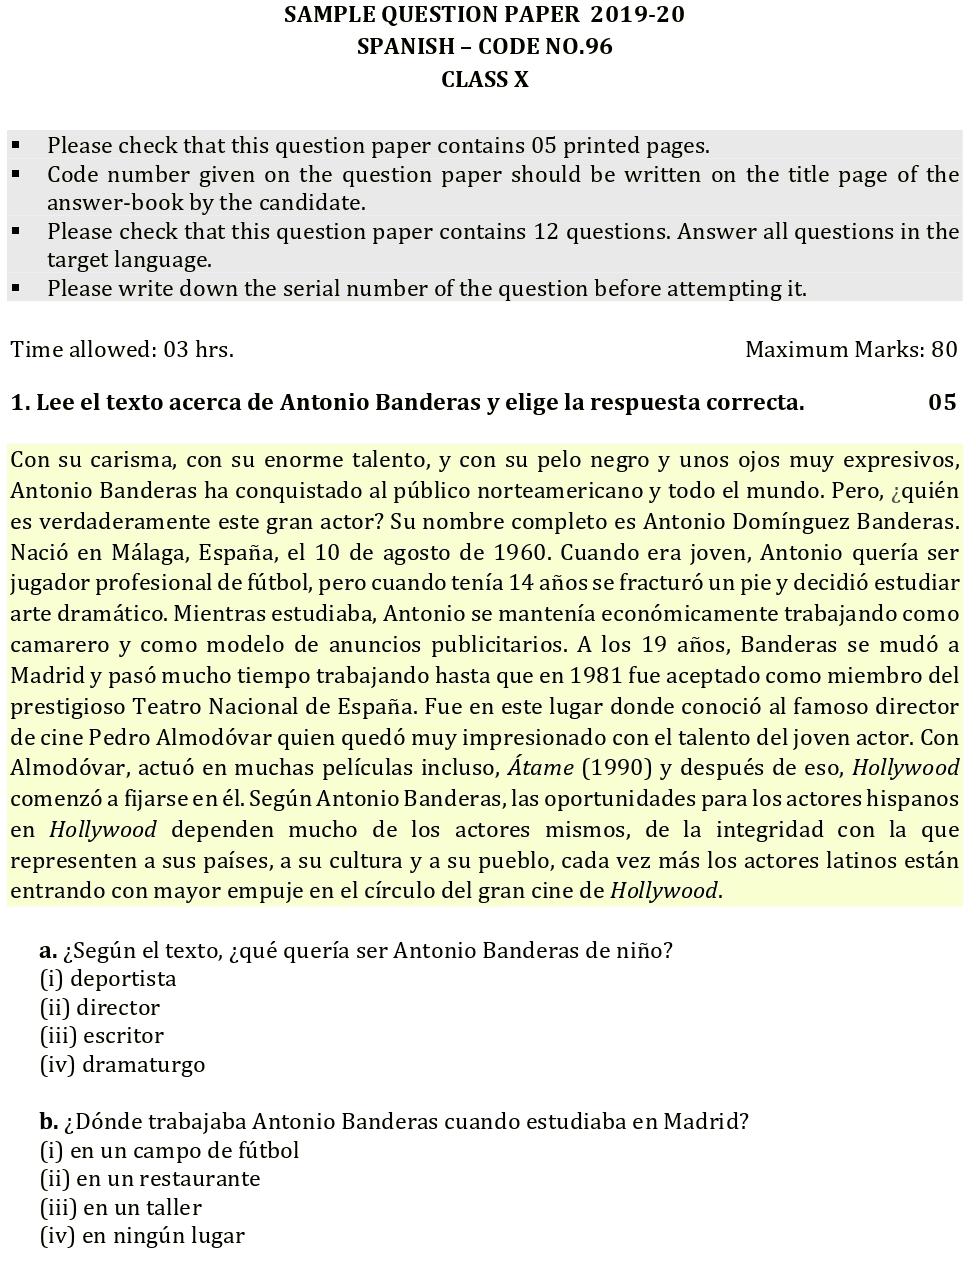 cbse spanish sample paper 2020